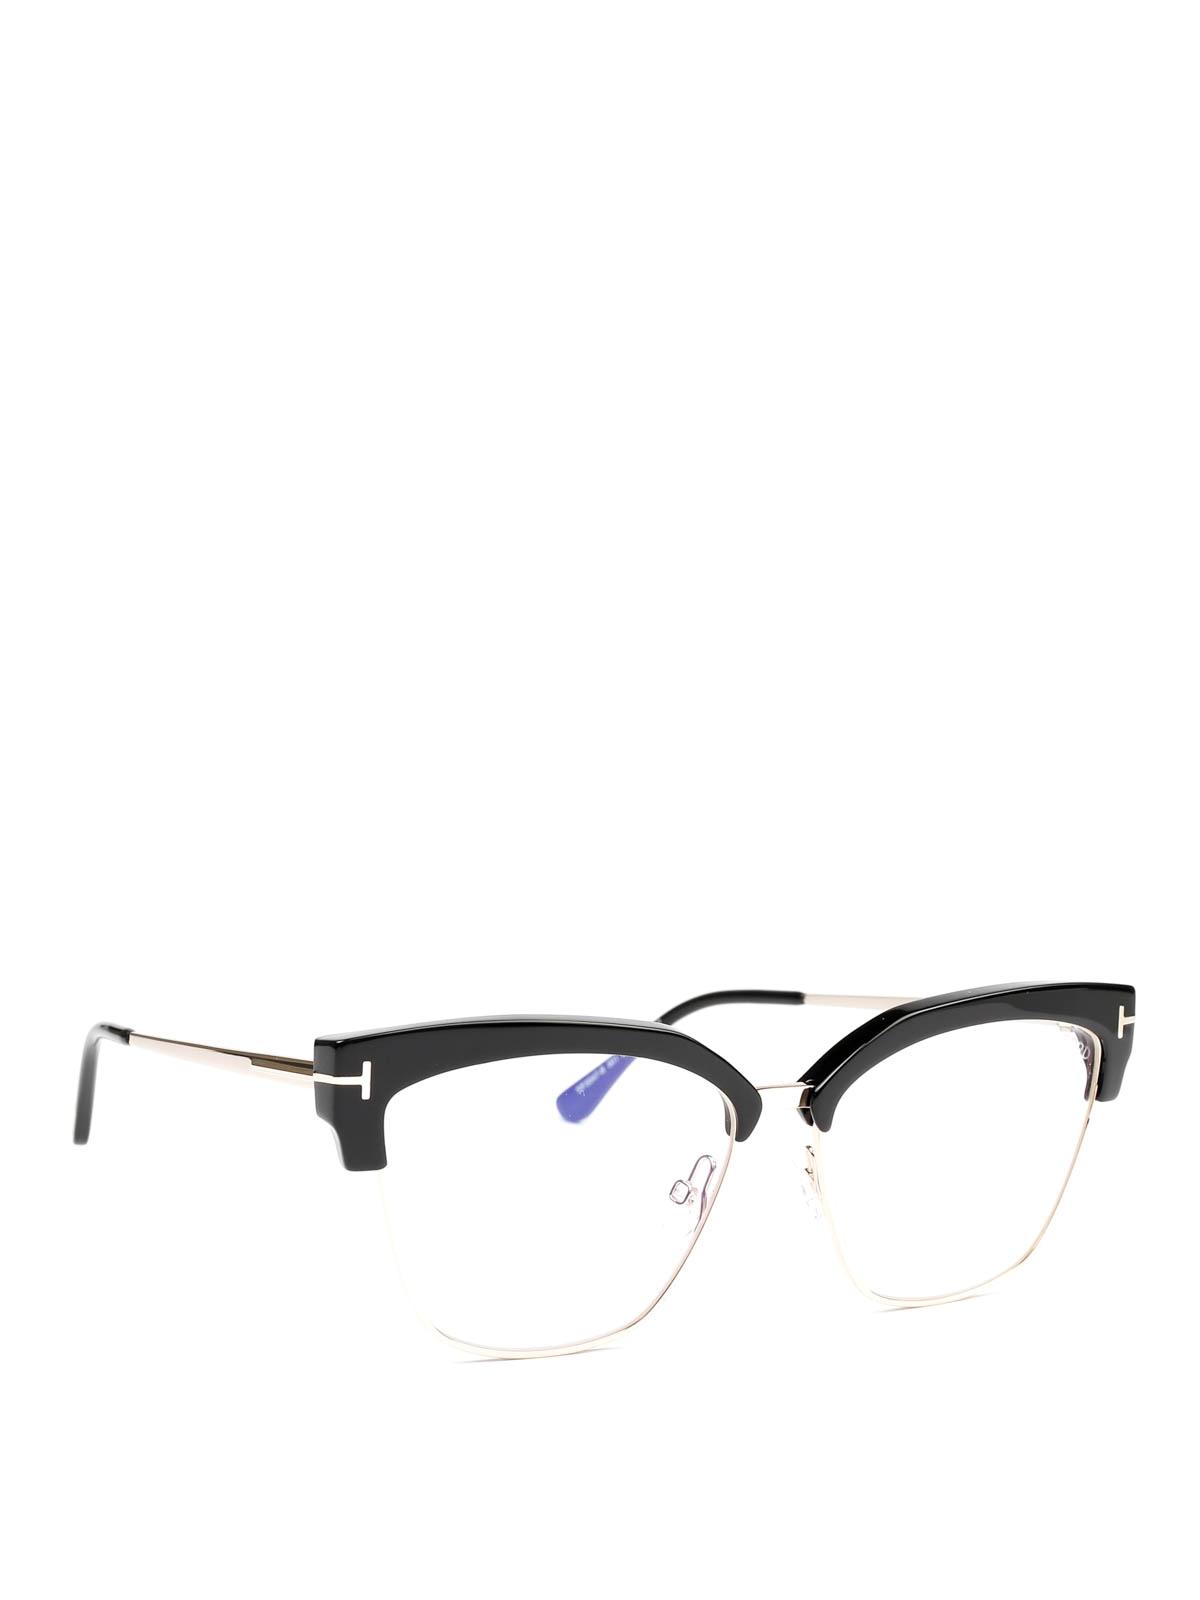 Tom Ford Black Metal And Acetate Eyeglasses